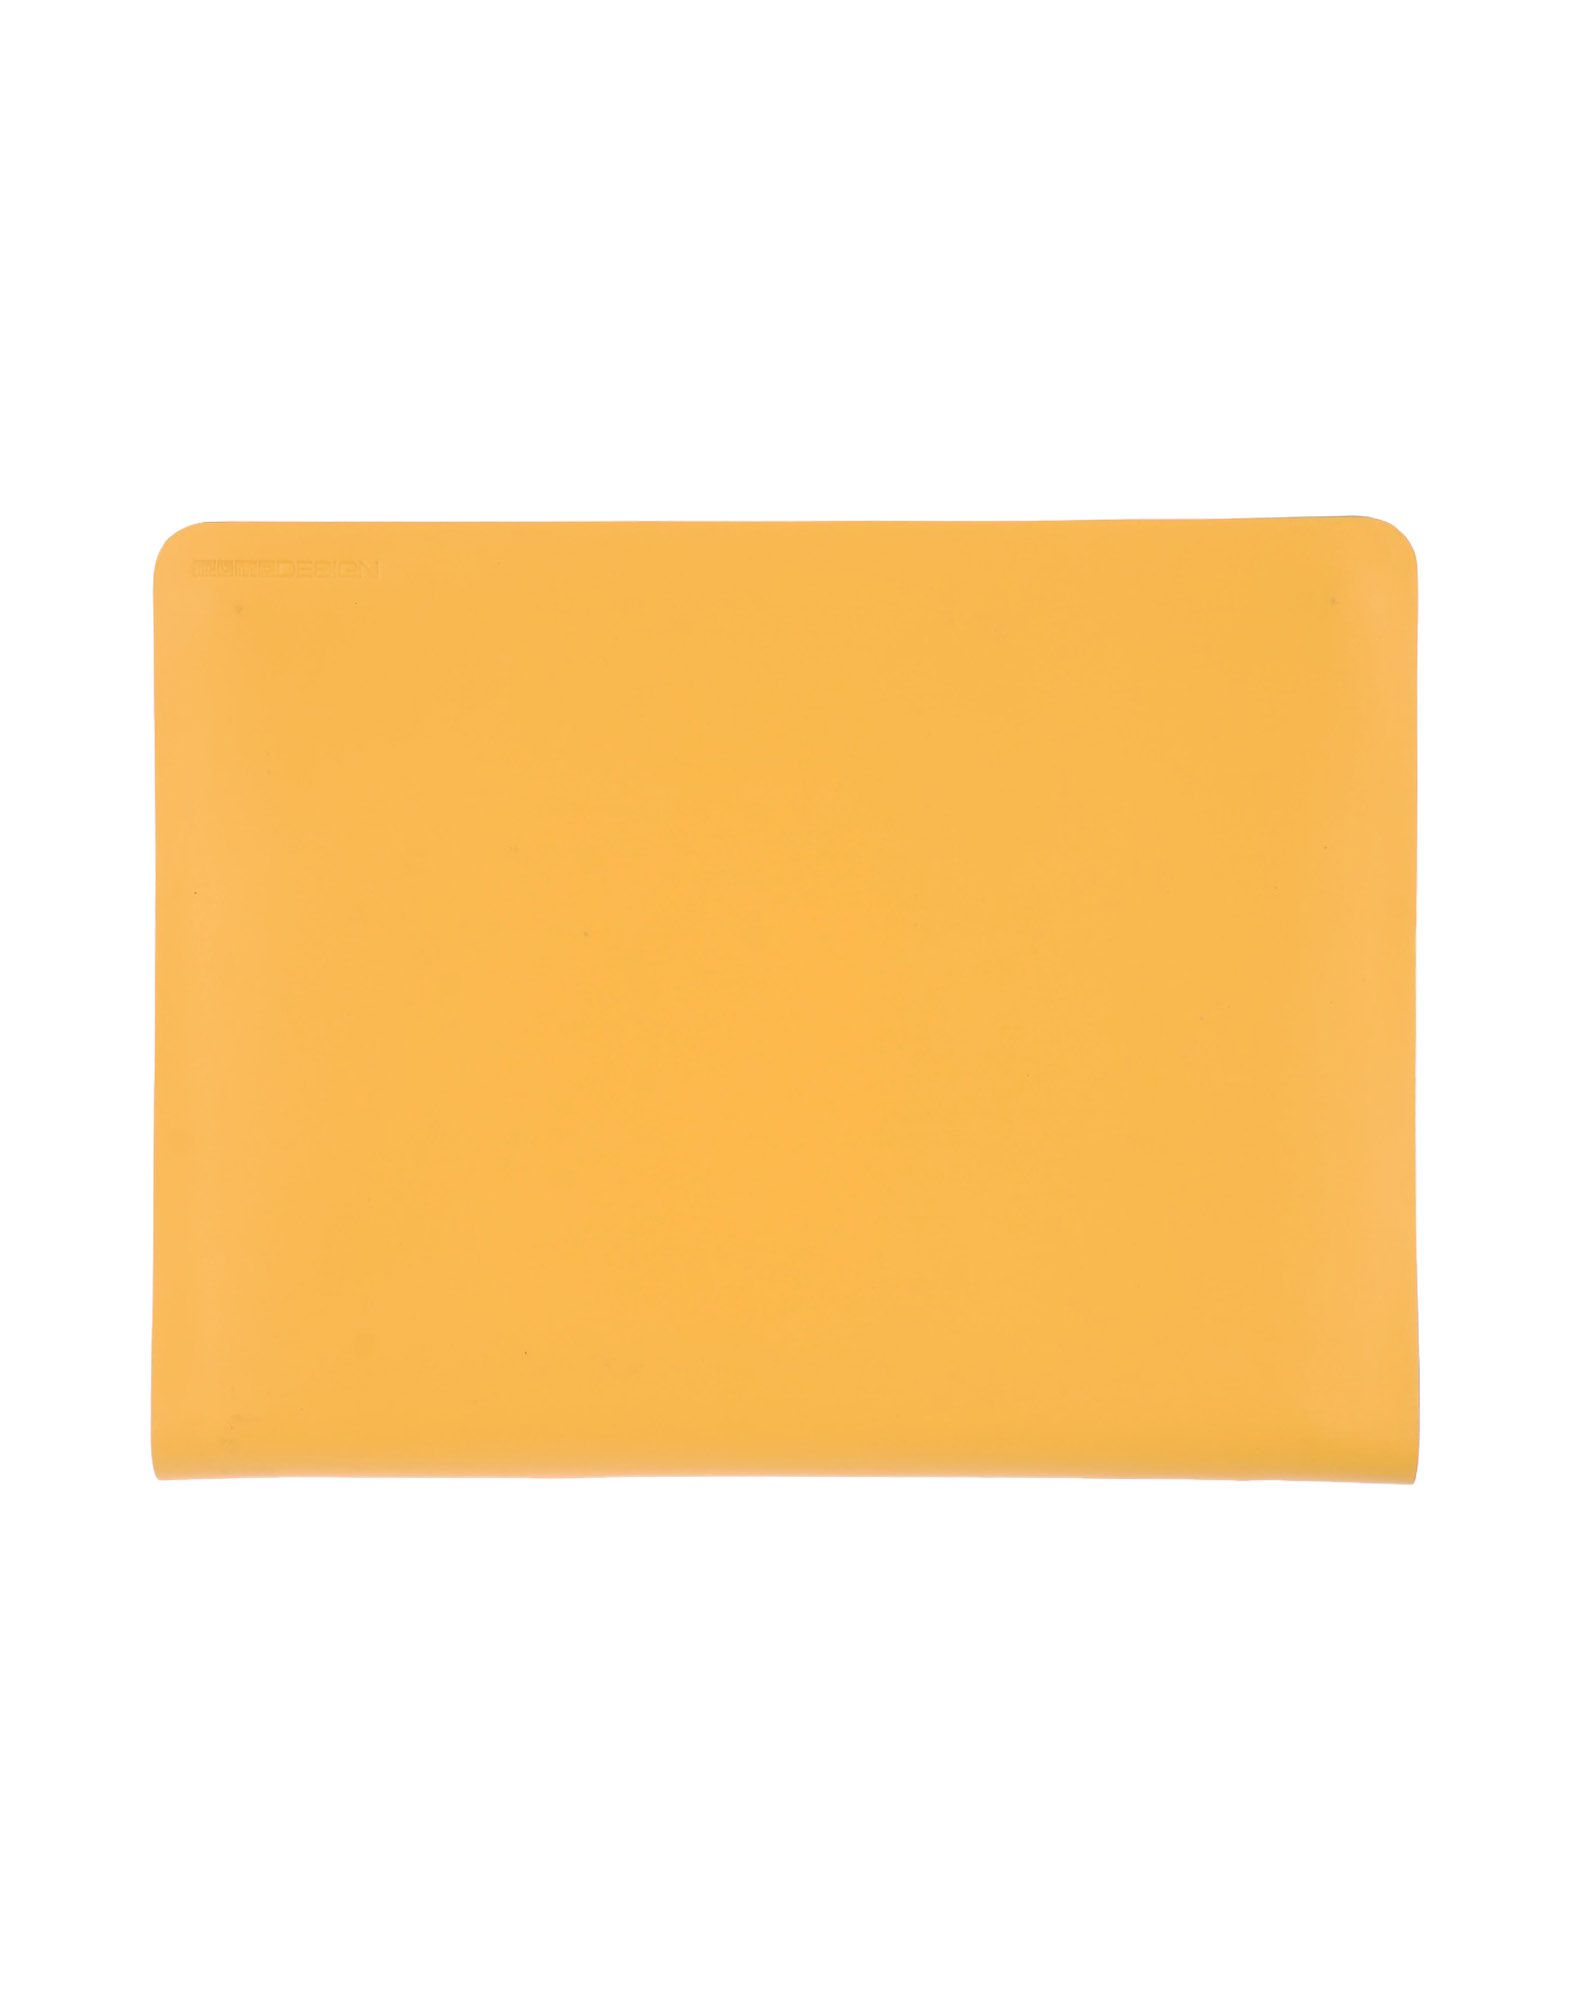 MOMO DESIGN Document holders